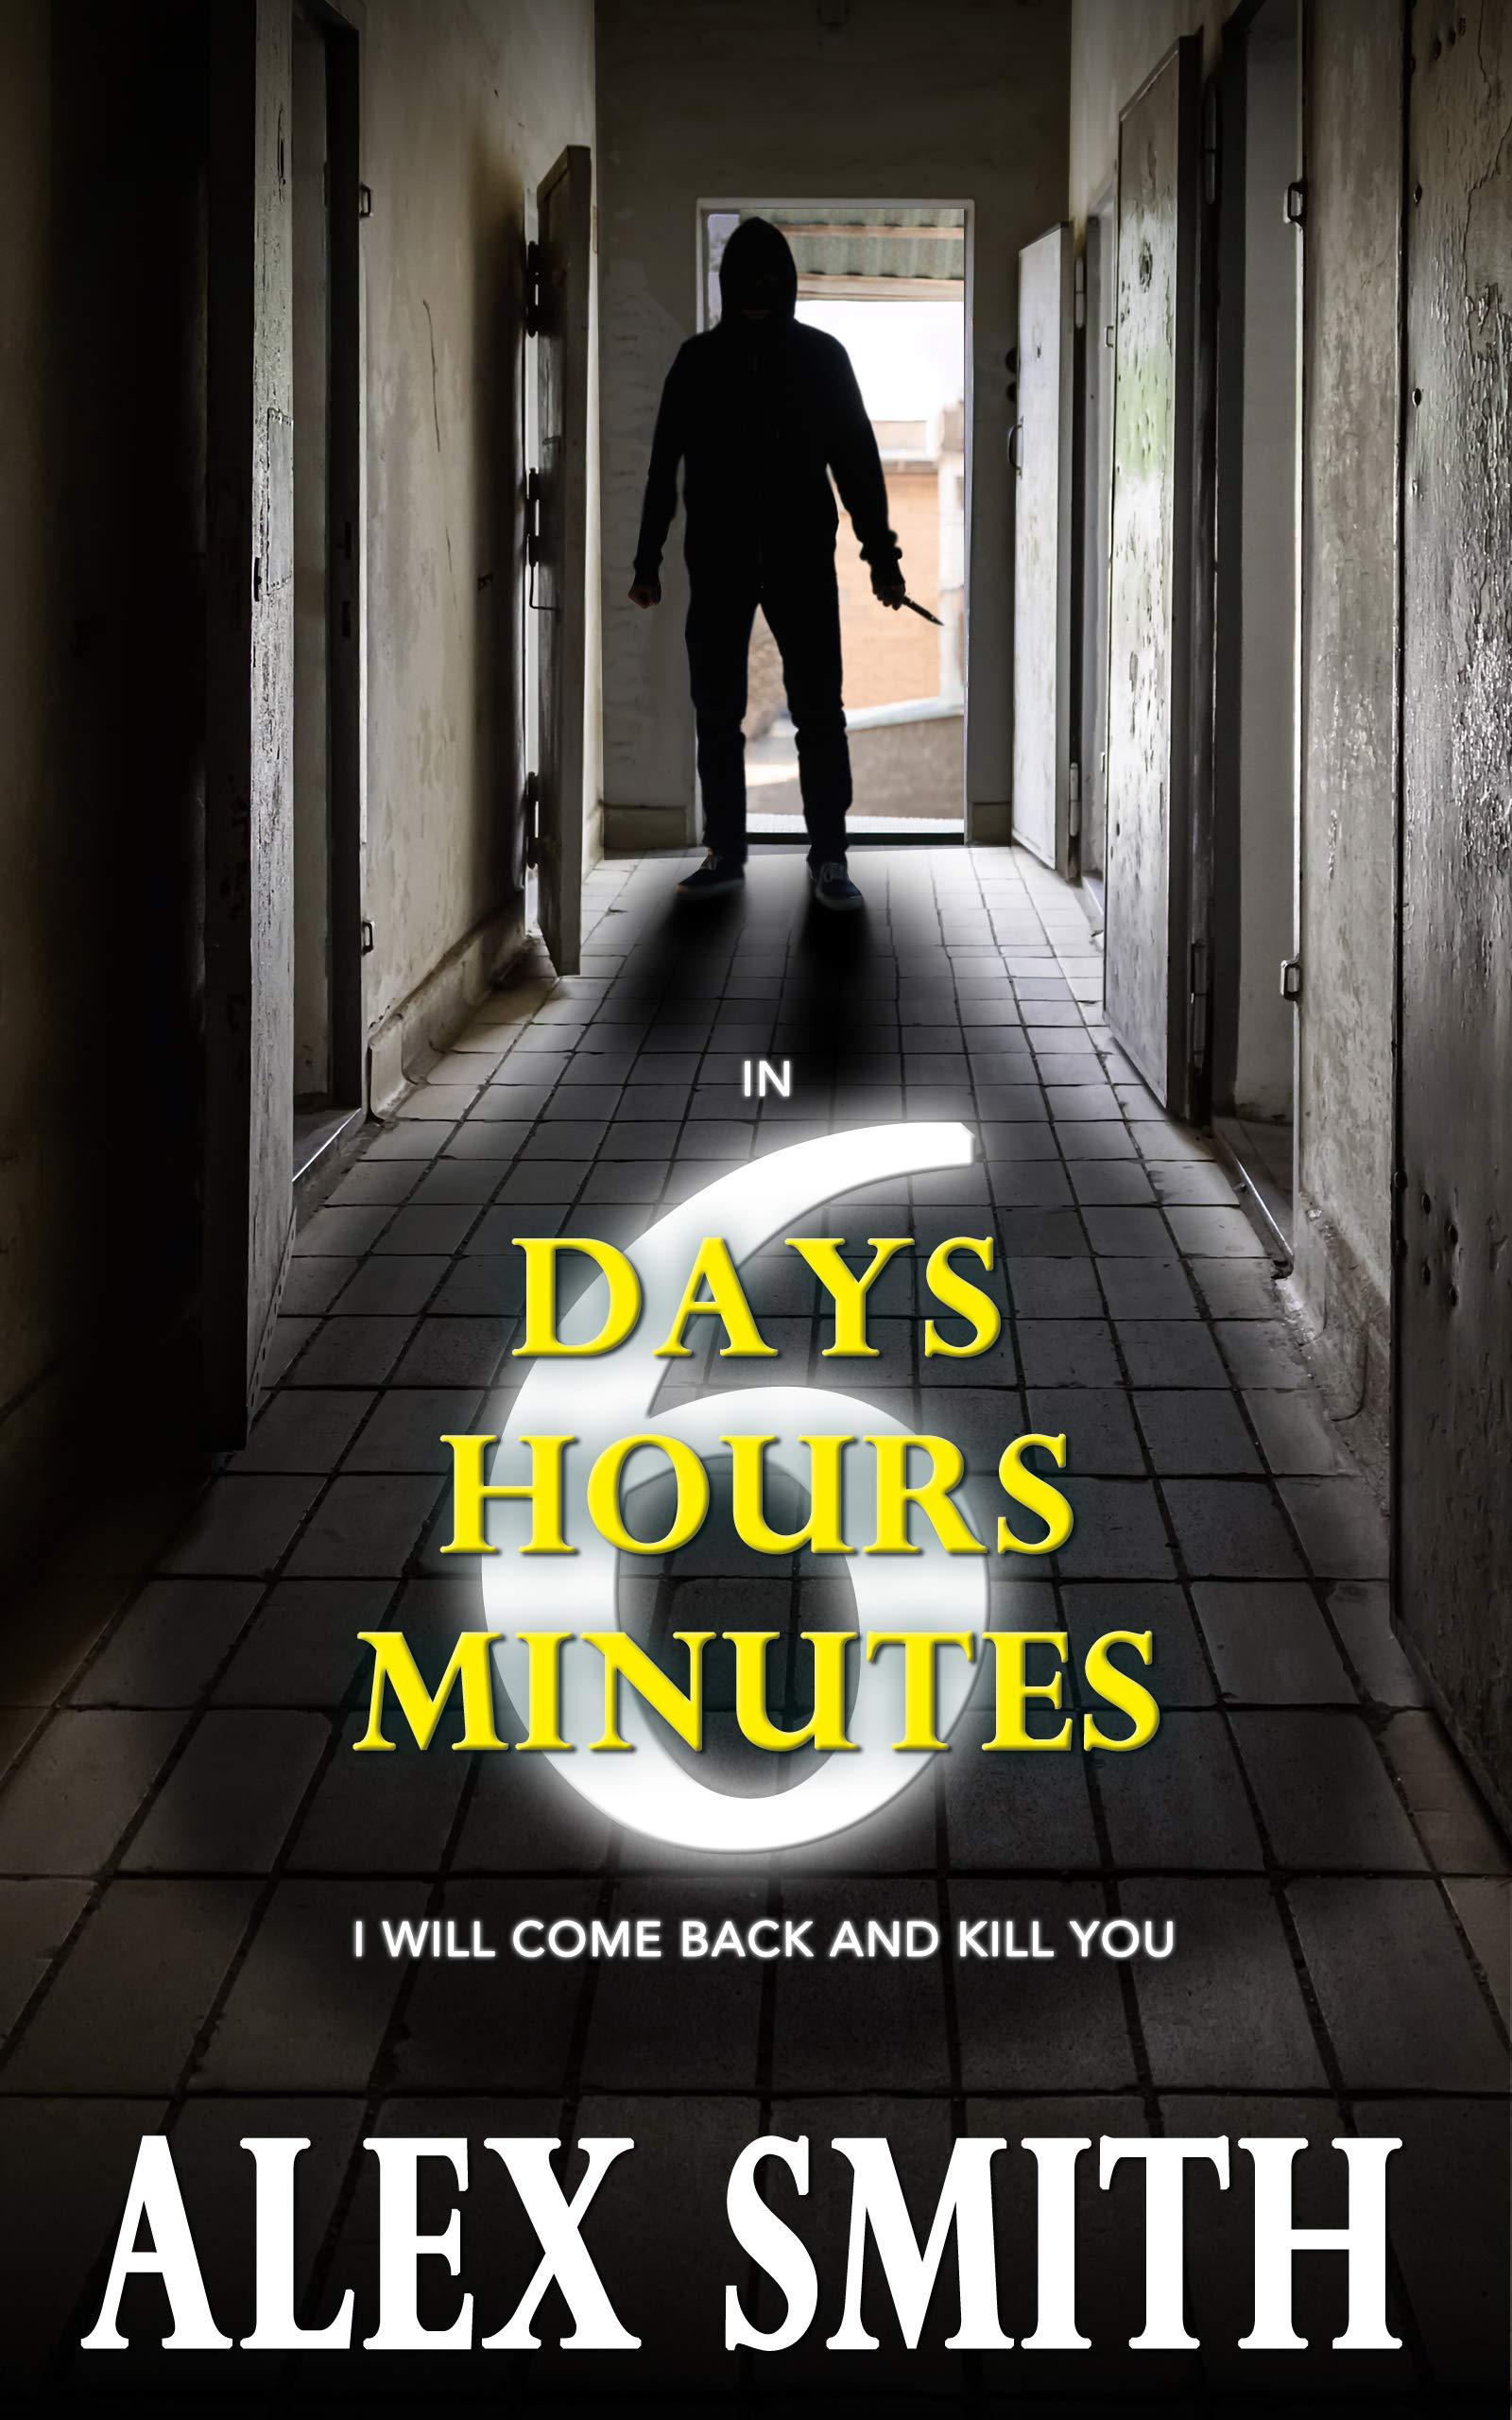 Six Days, Six Hours, Six Minutes: A Brutal British Crime Thriller